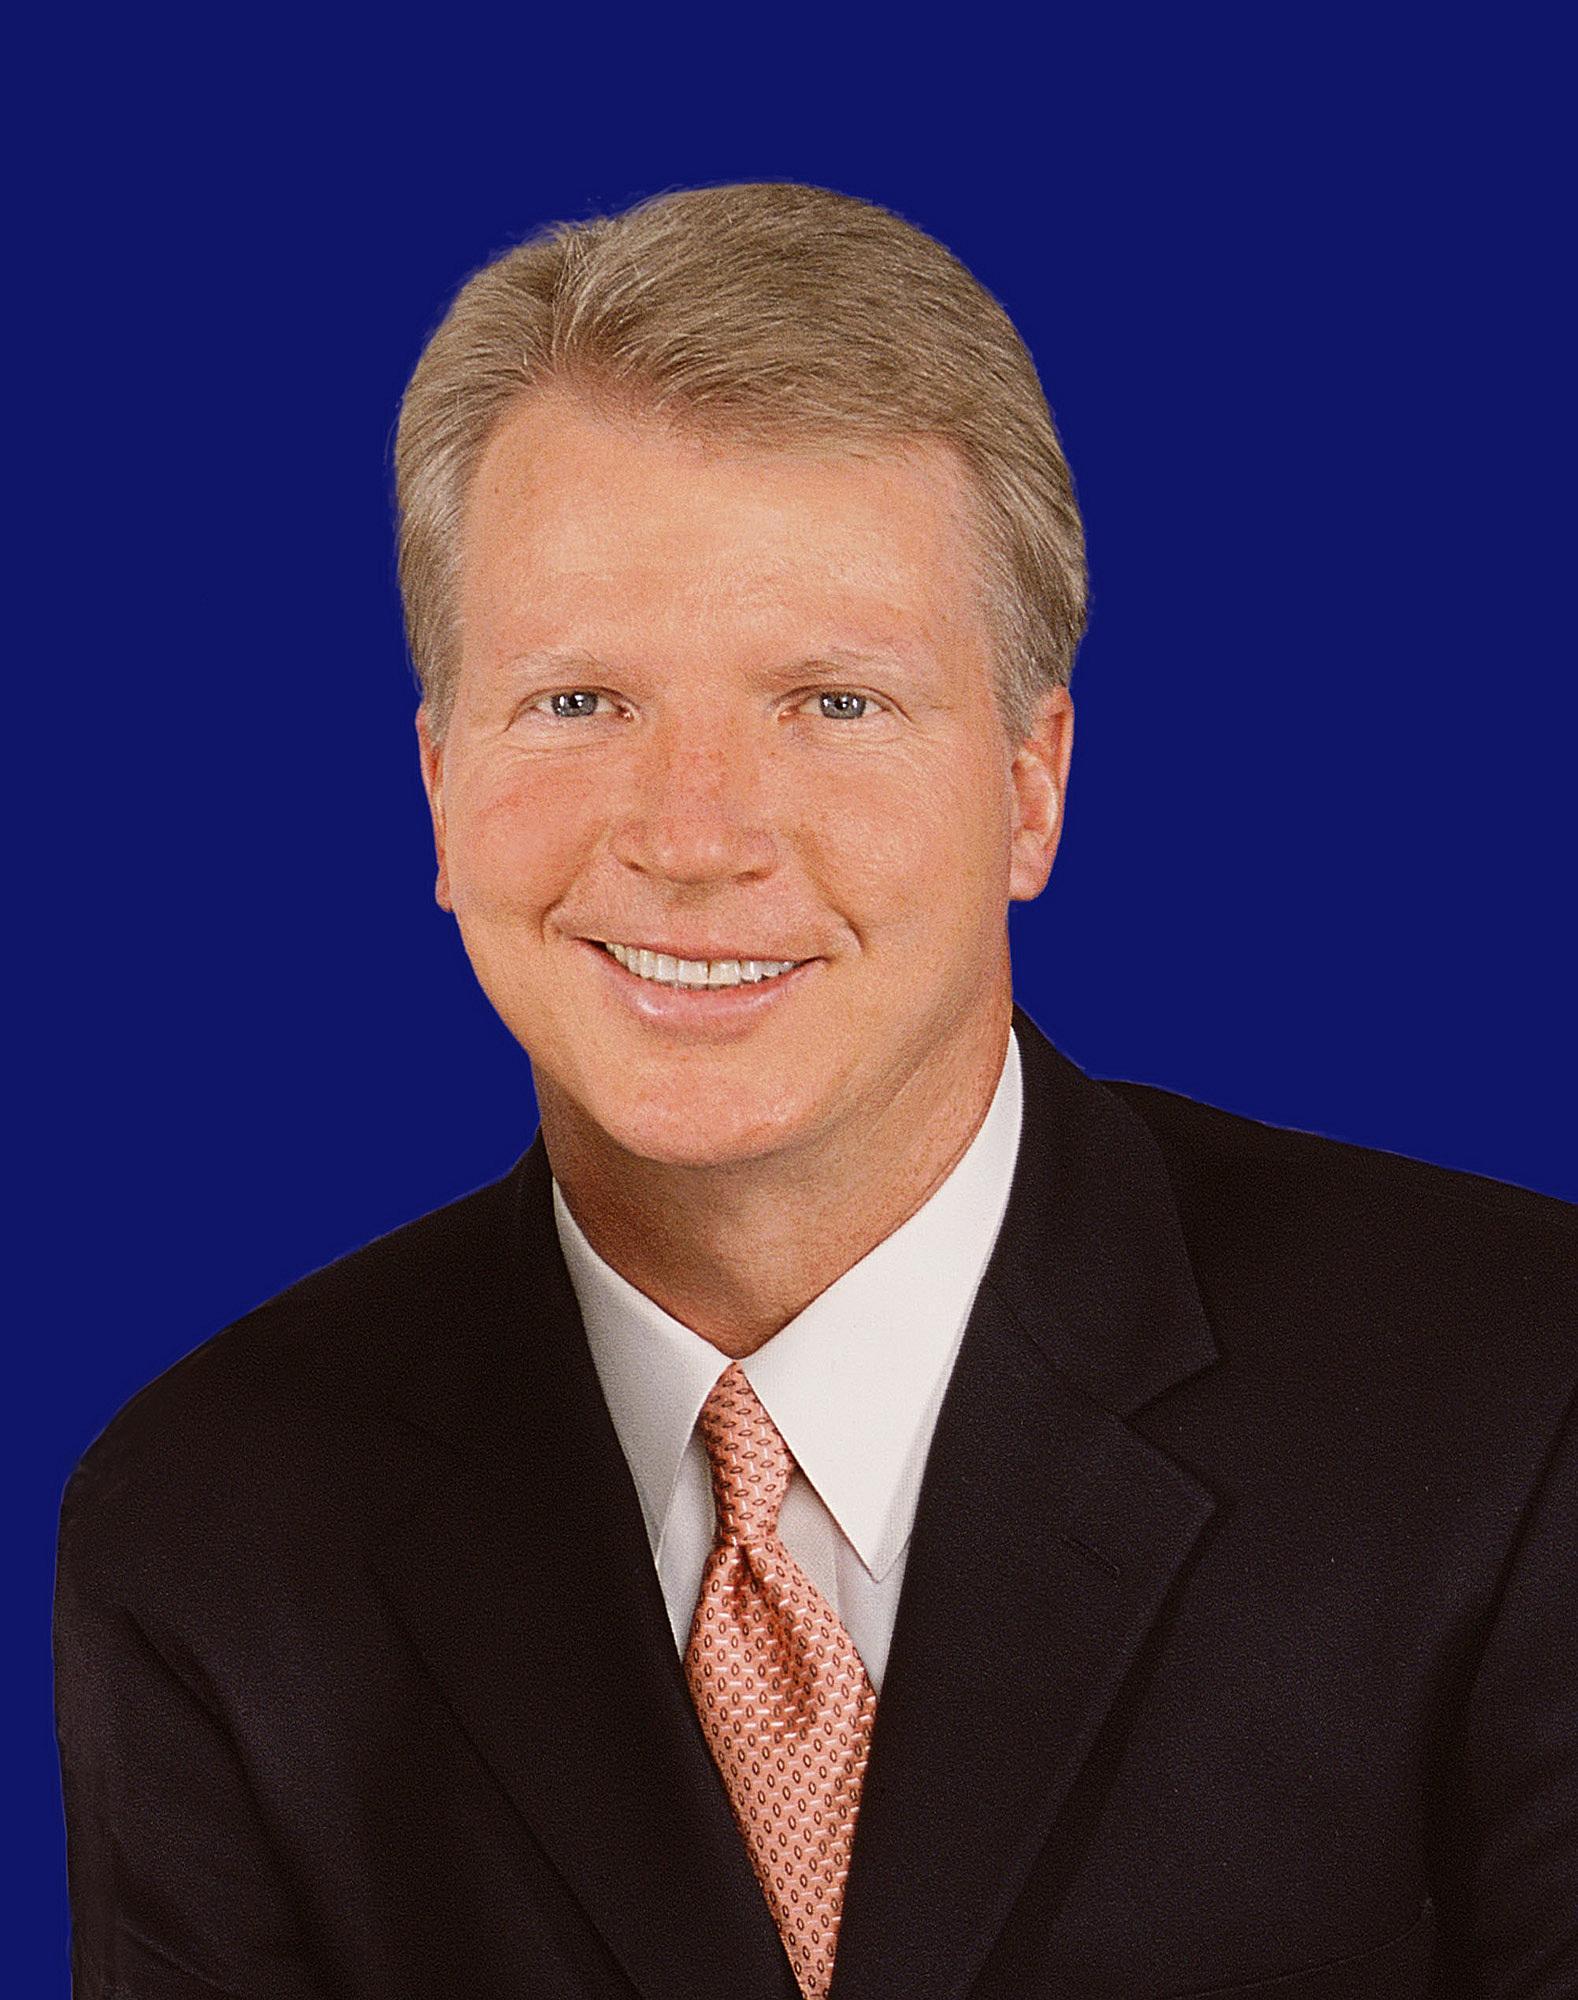 Phil-Simms-speaker